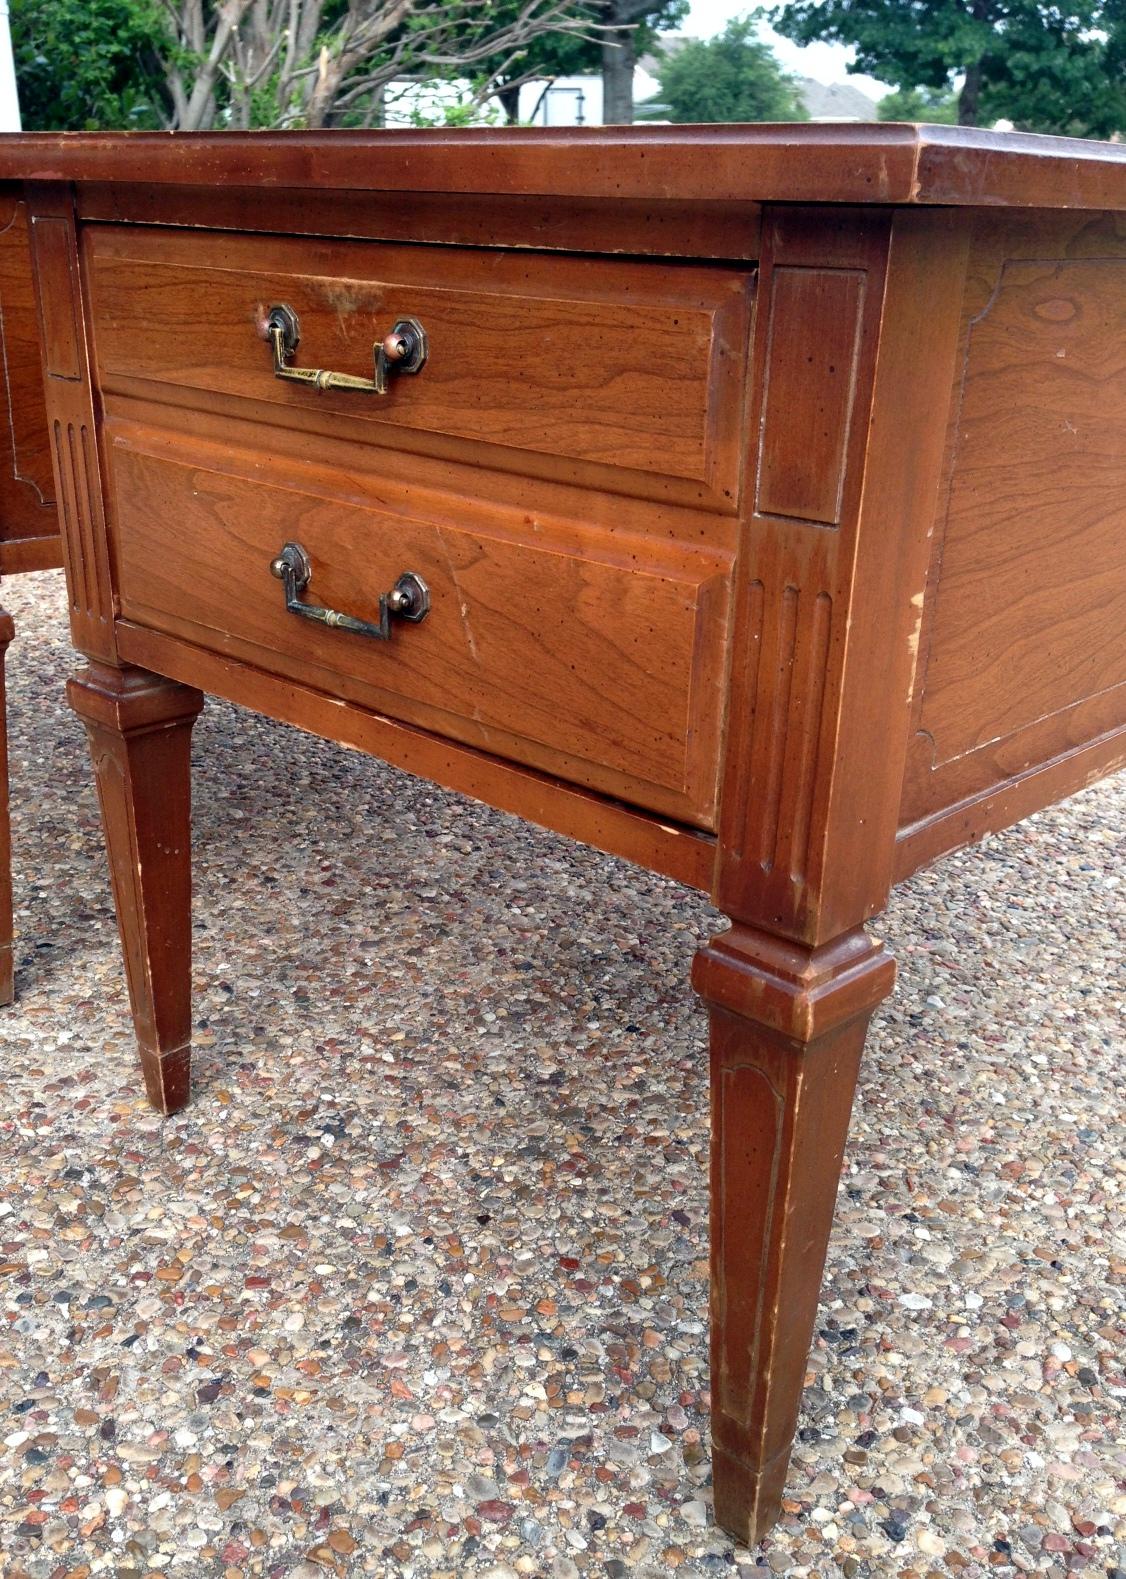 Merveilleux Hammary End Table Leg And Corner Detail ...